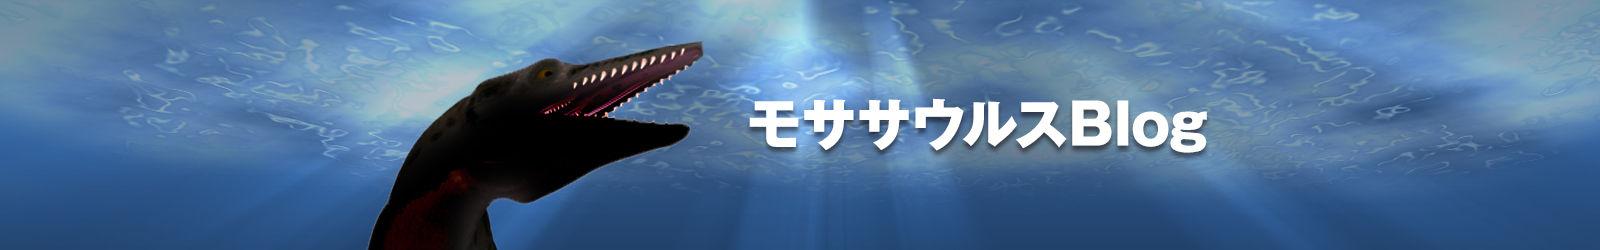 mosasaurのblog イメージ画像